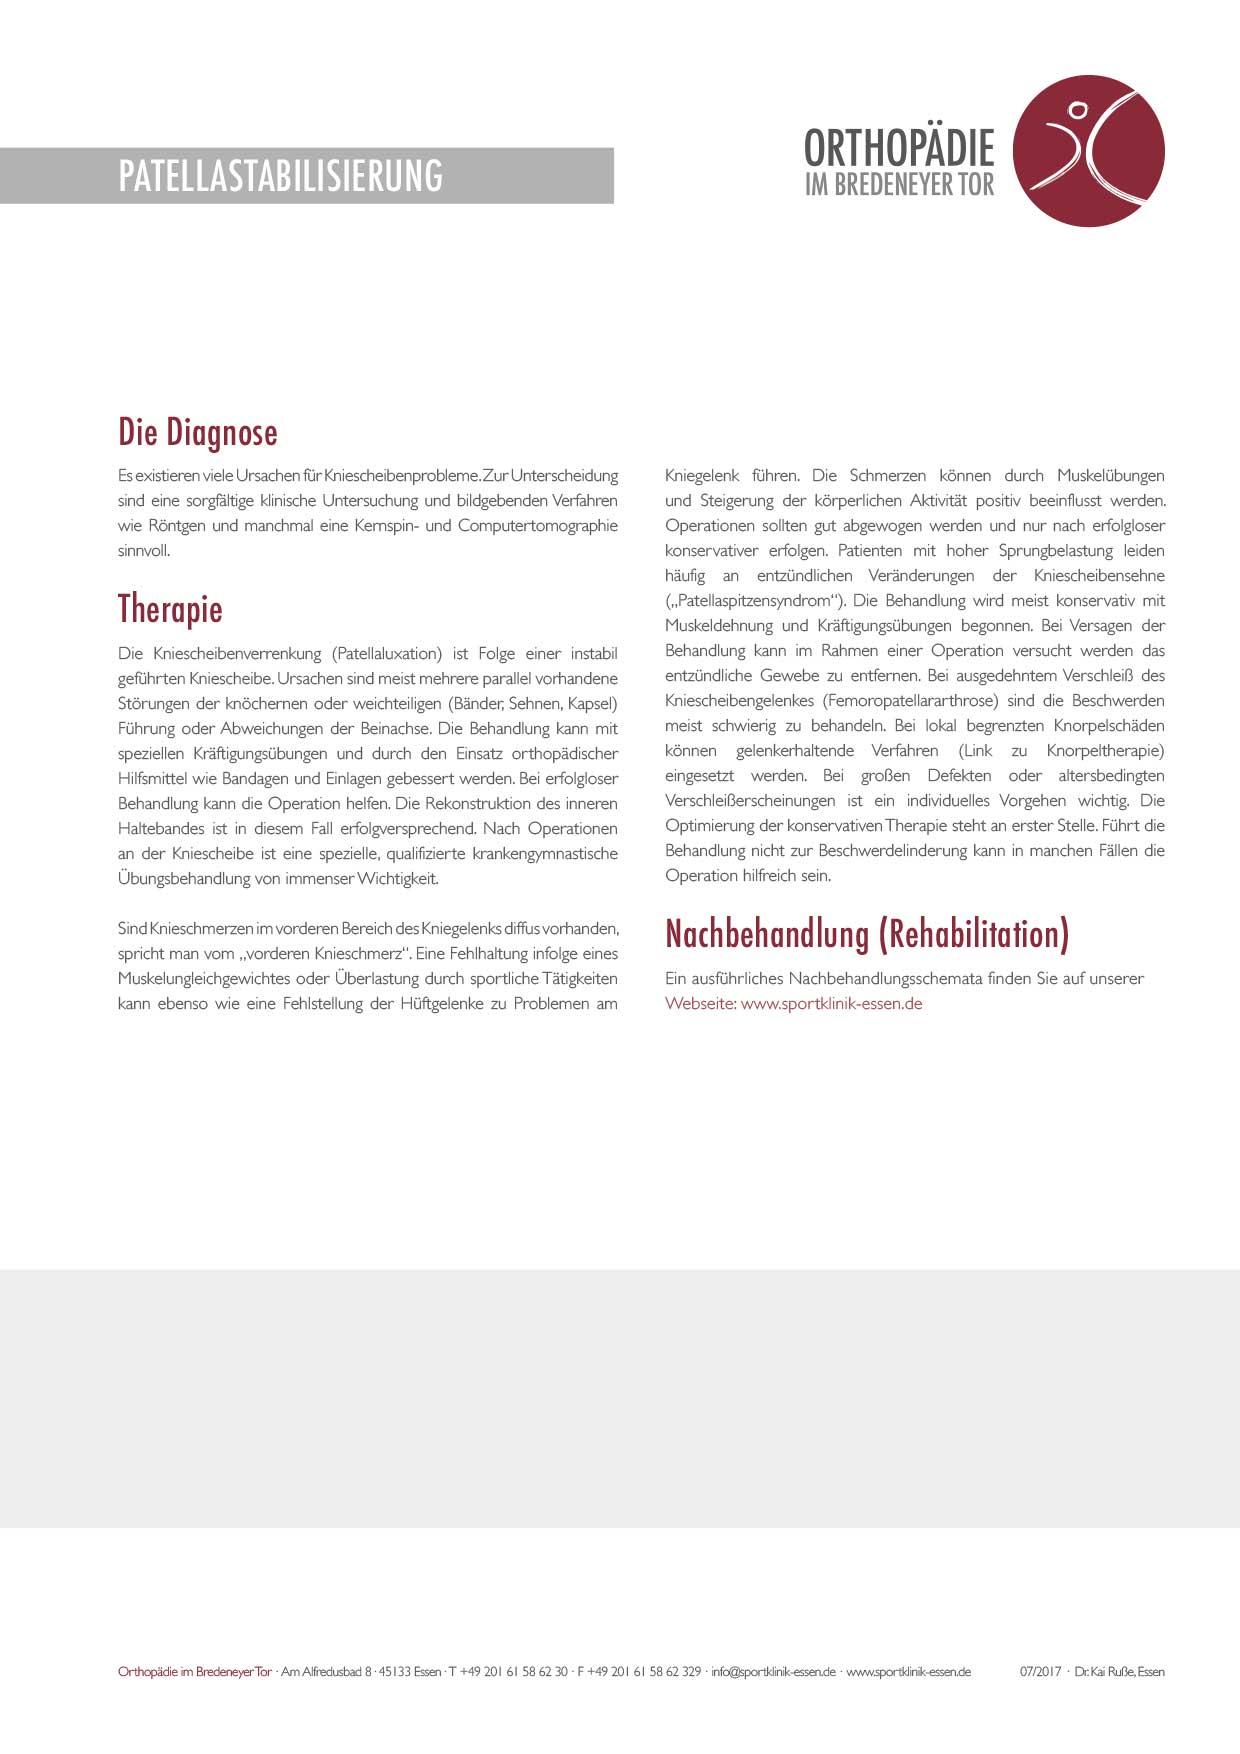 Nett Ty Drahtgrößen Bilder - Der Schaltplan - greigo.com